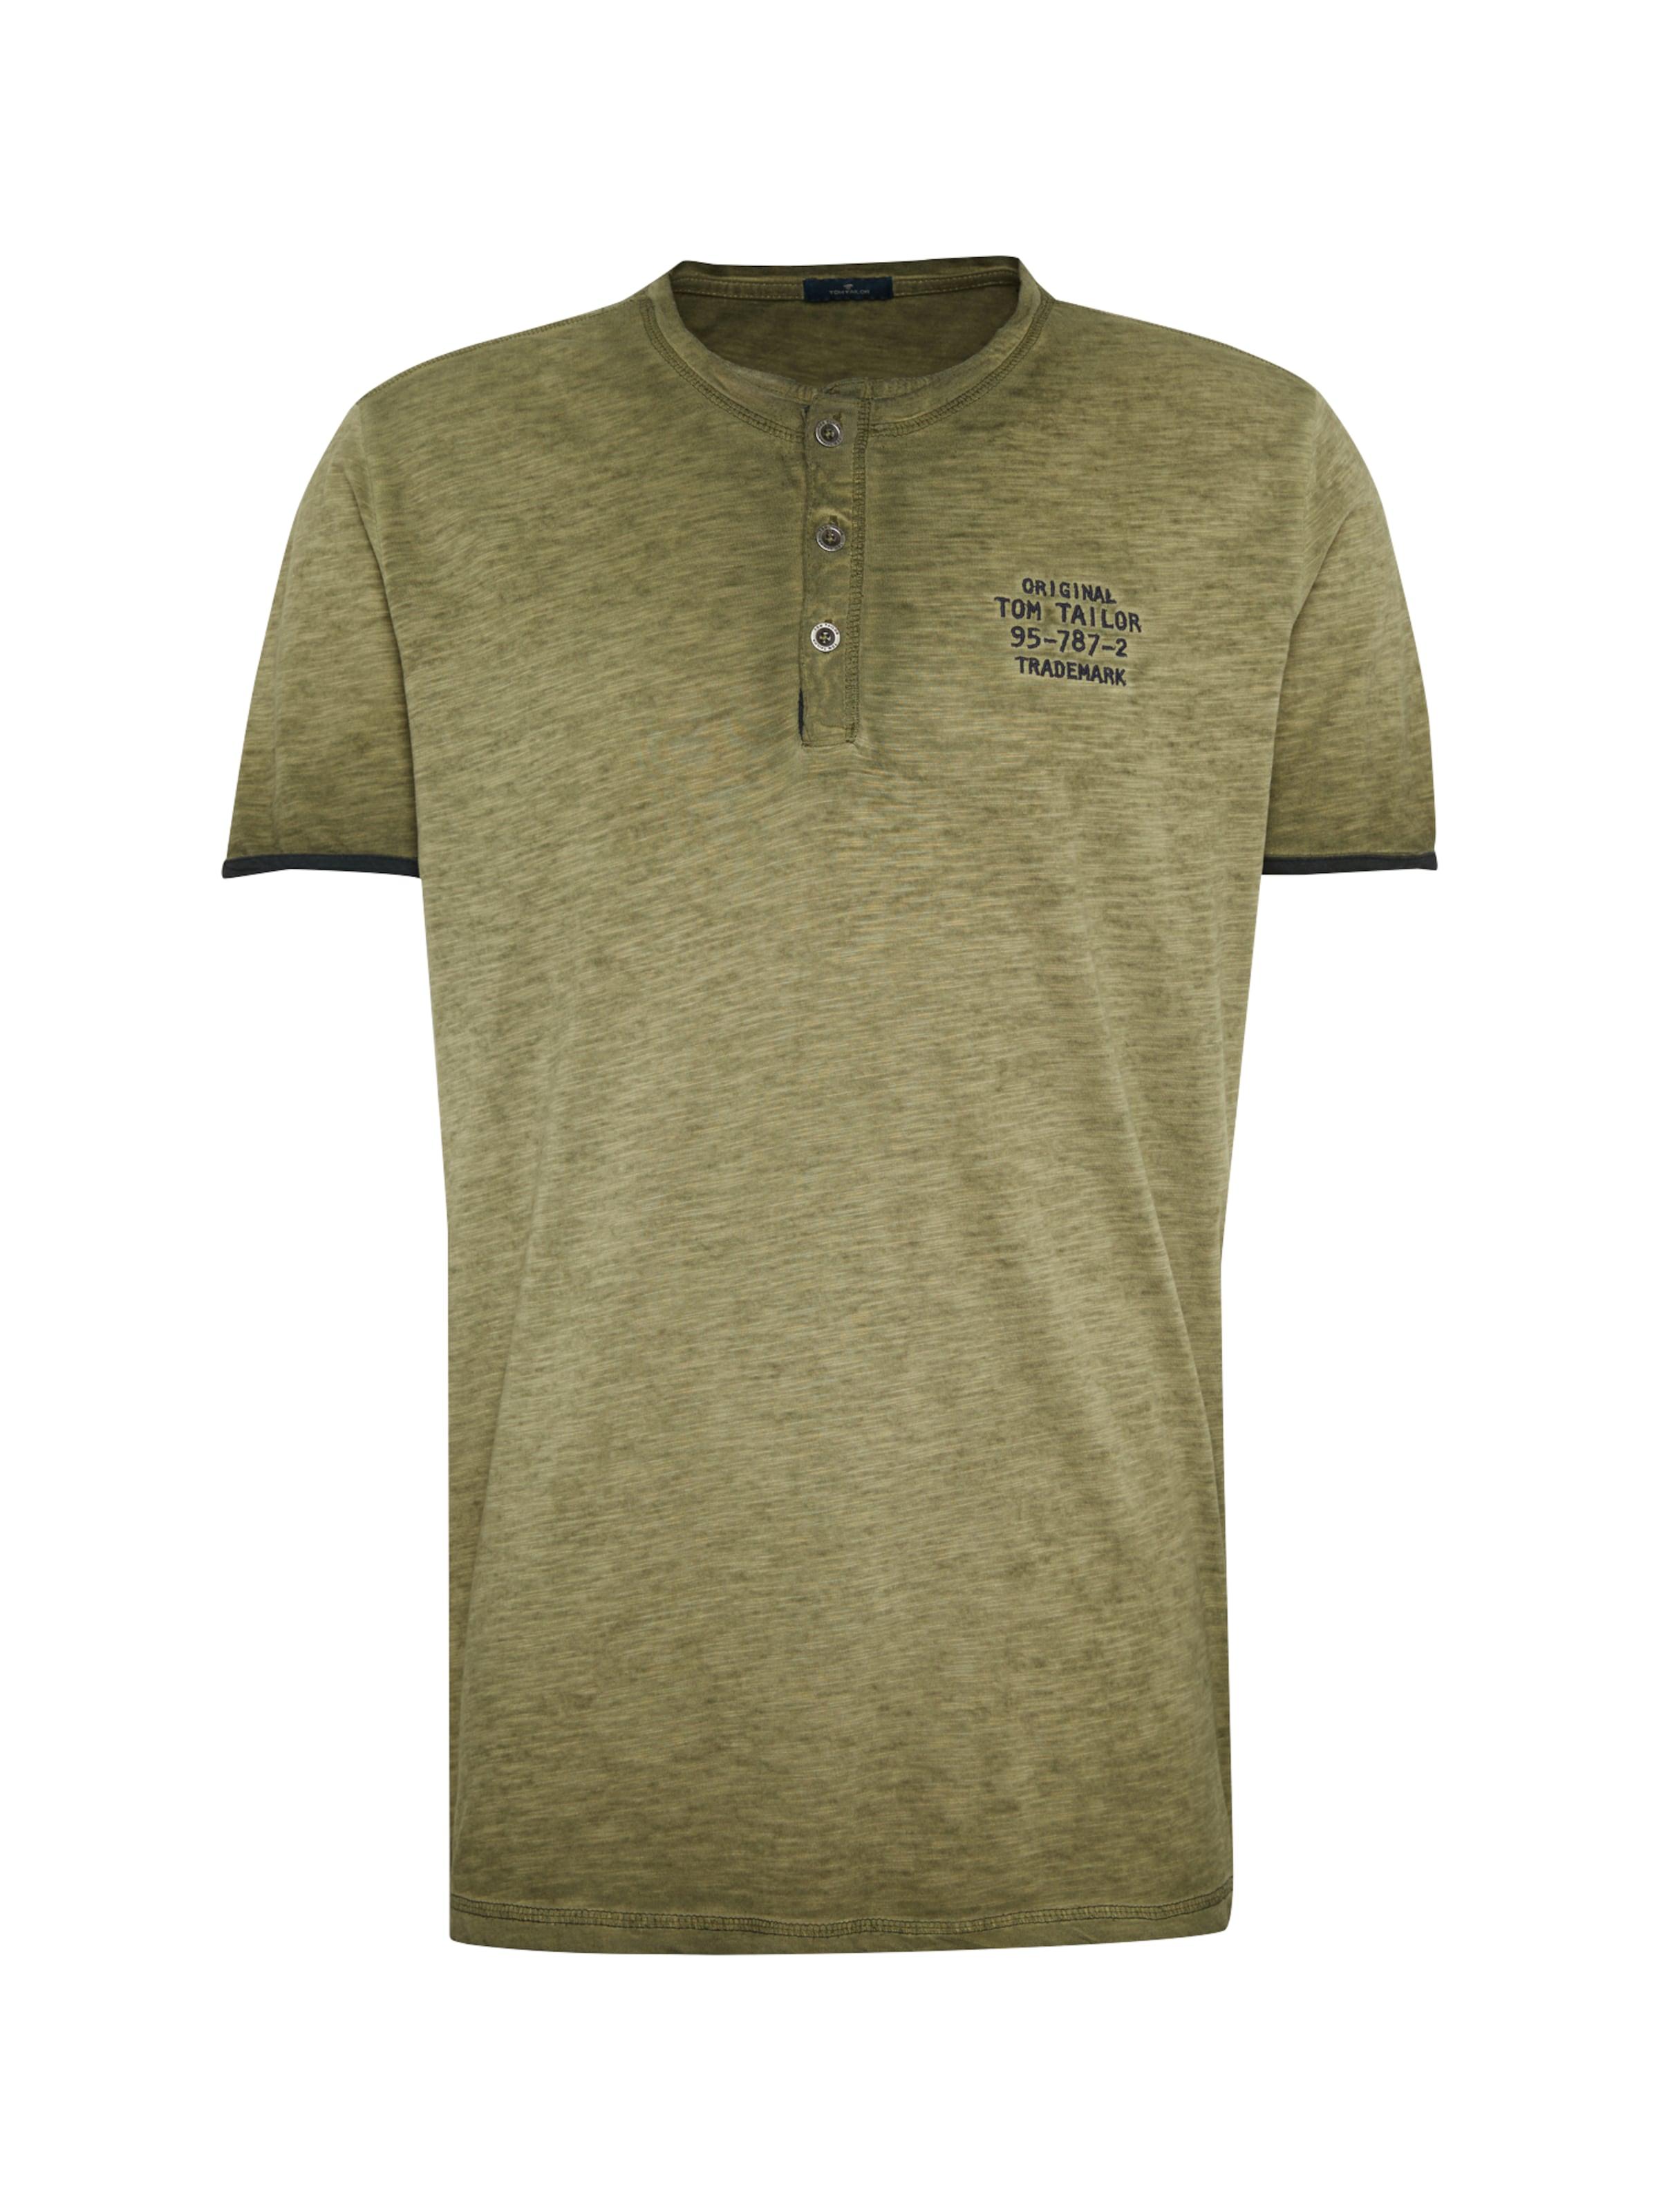 shirt Inside Tailor 'tee Olive Treatement' With Tom T En OiPXkZu